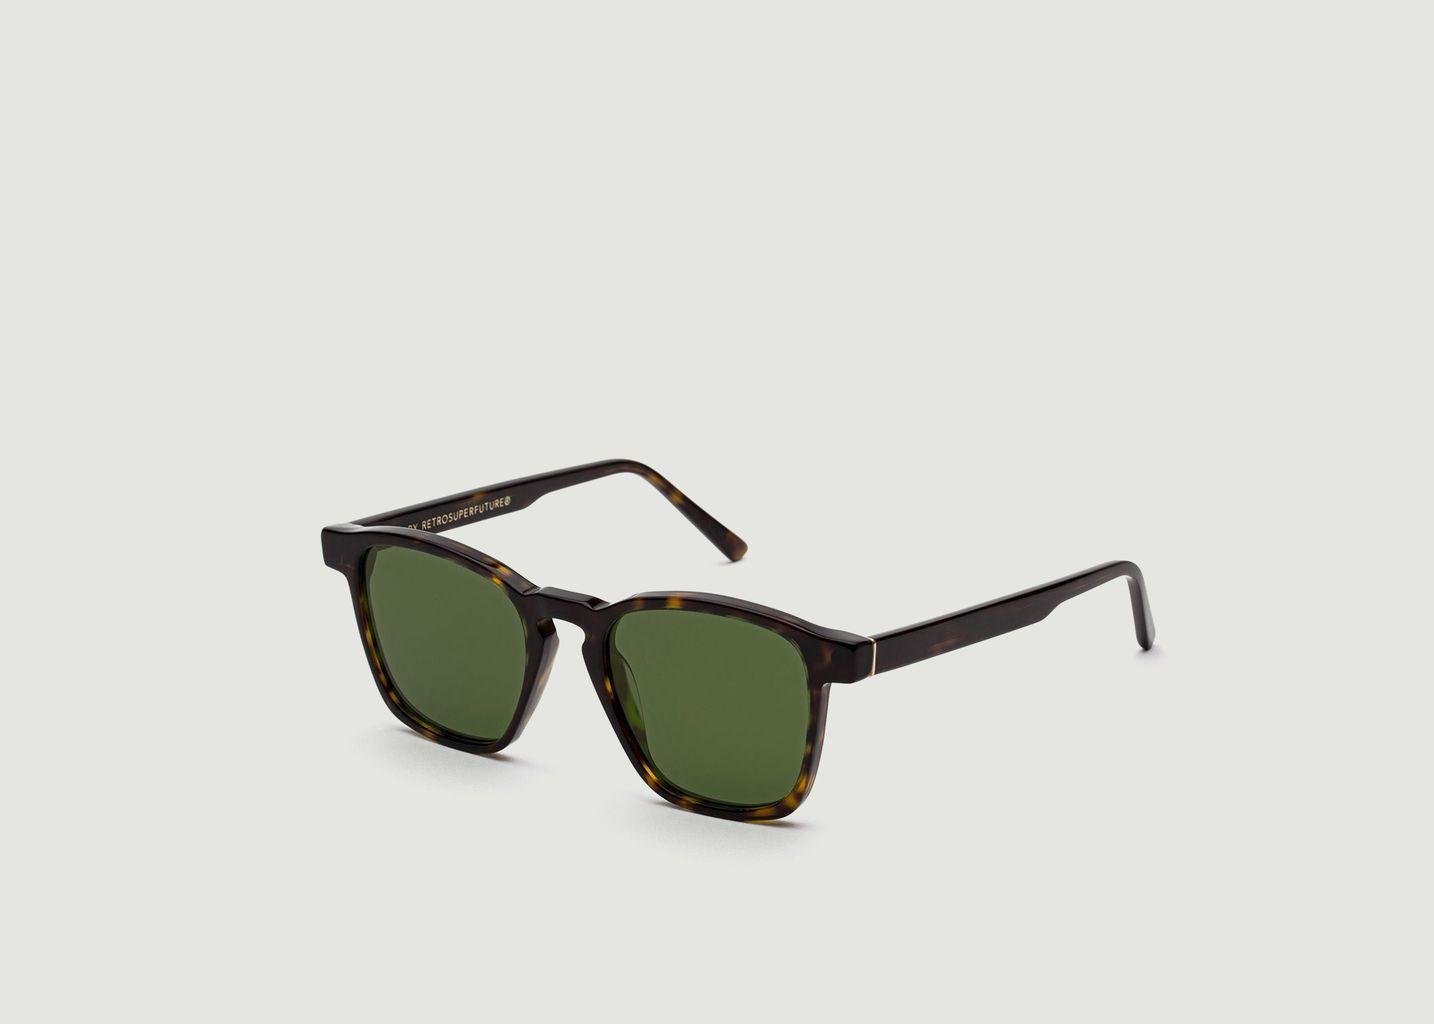 the latest 4c0e0 f77c7 Unico 3627 Sunglasses - RETROSUPERFUTURE